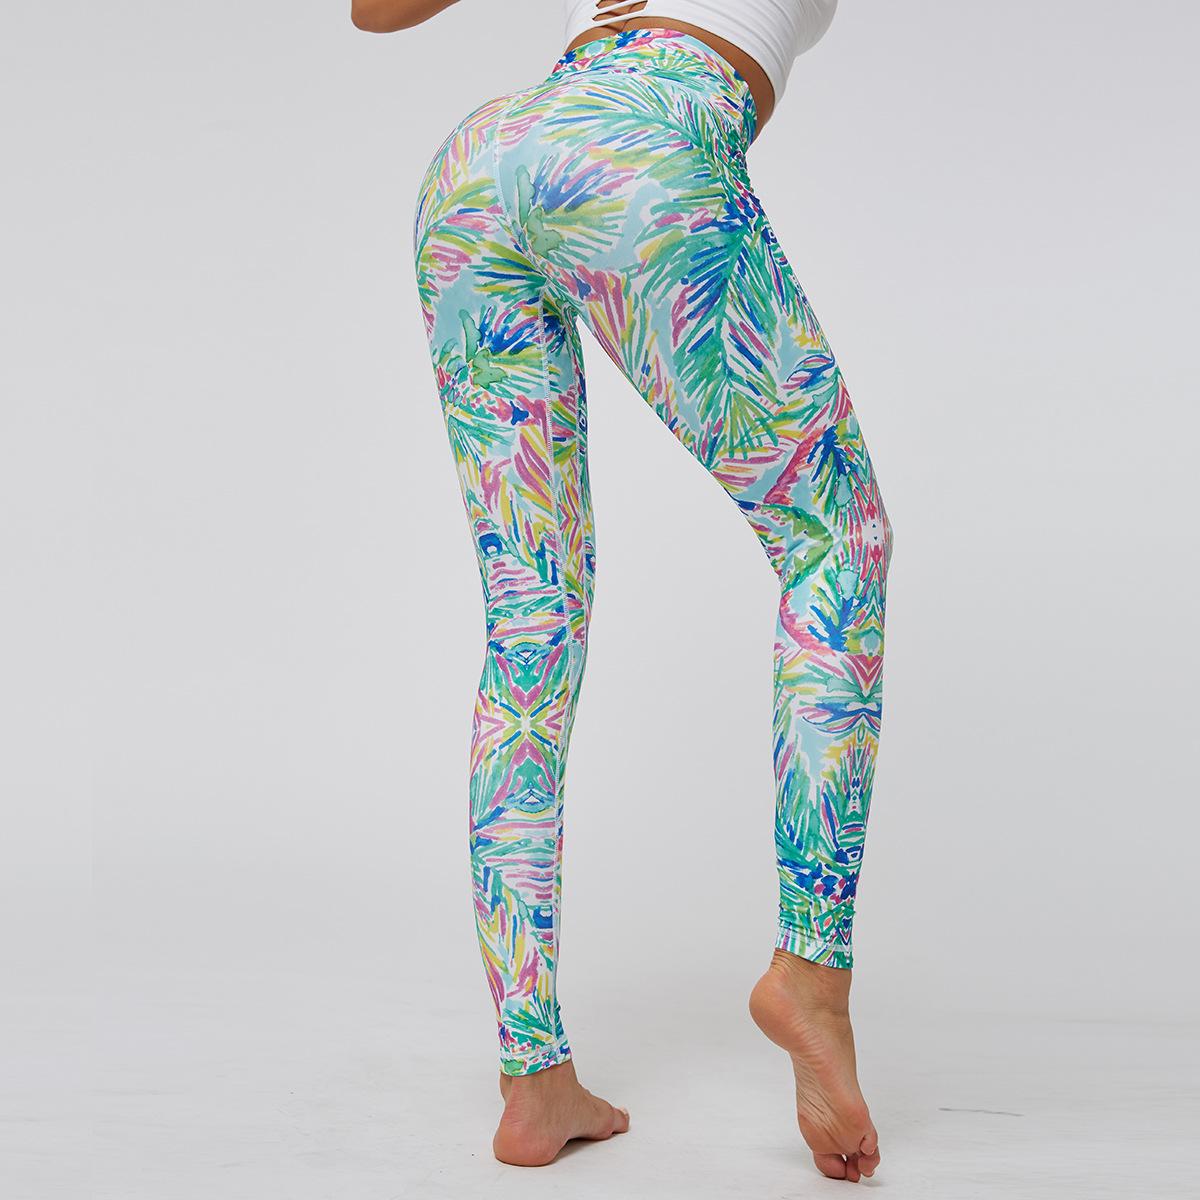 Tight-fitting high-waist hip digital print sports yoga pants NHMA155859